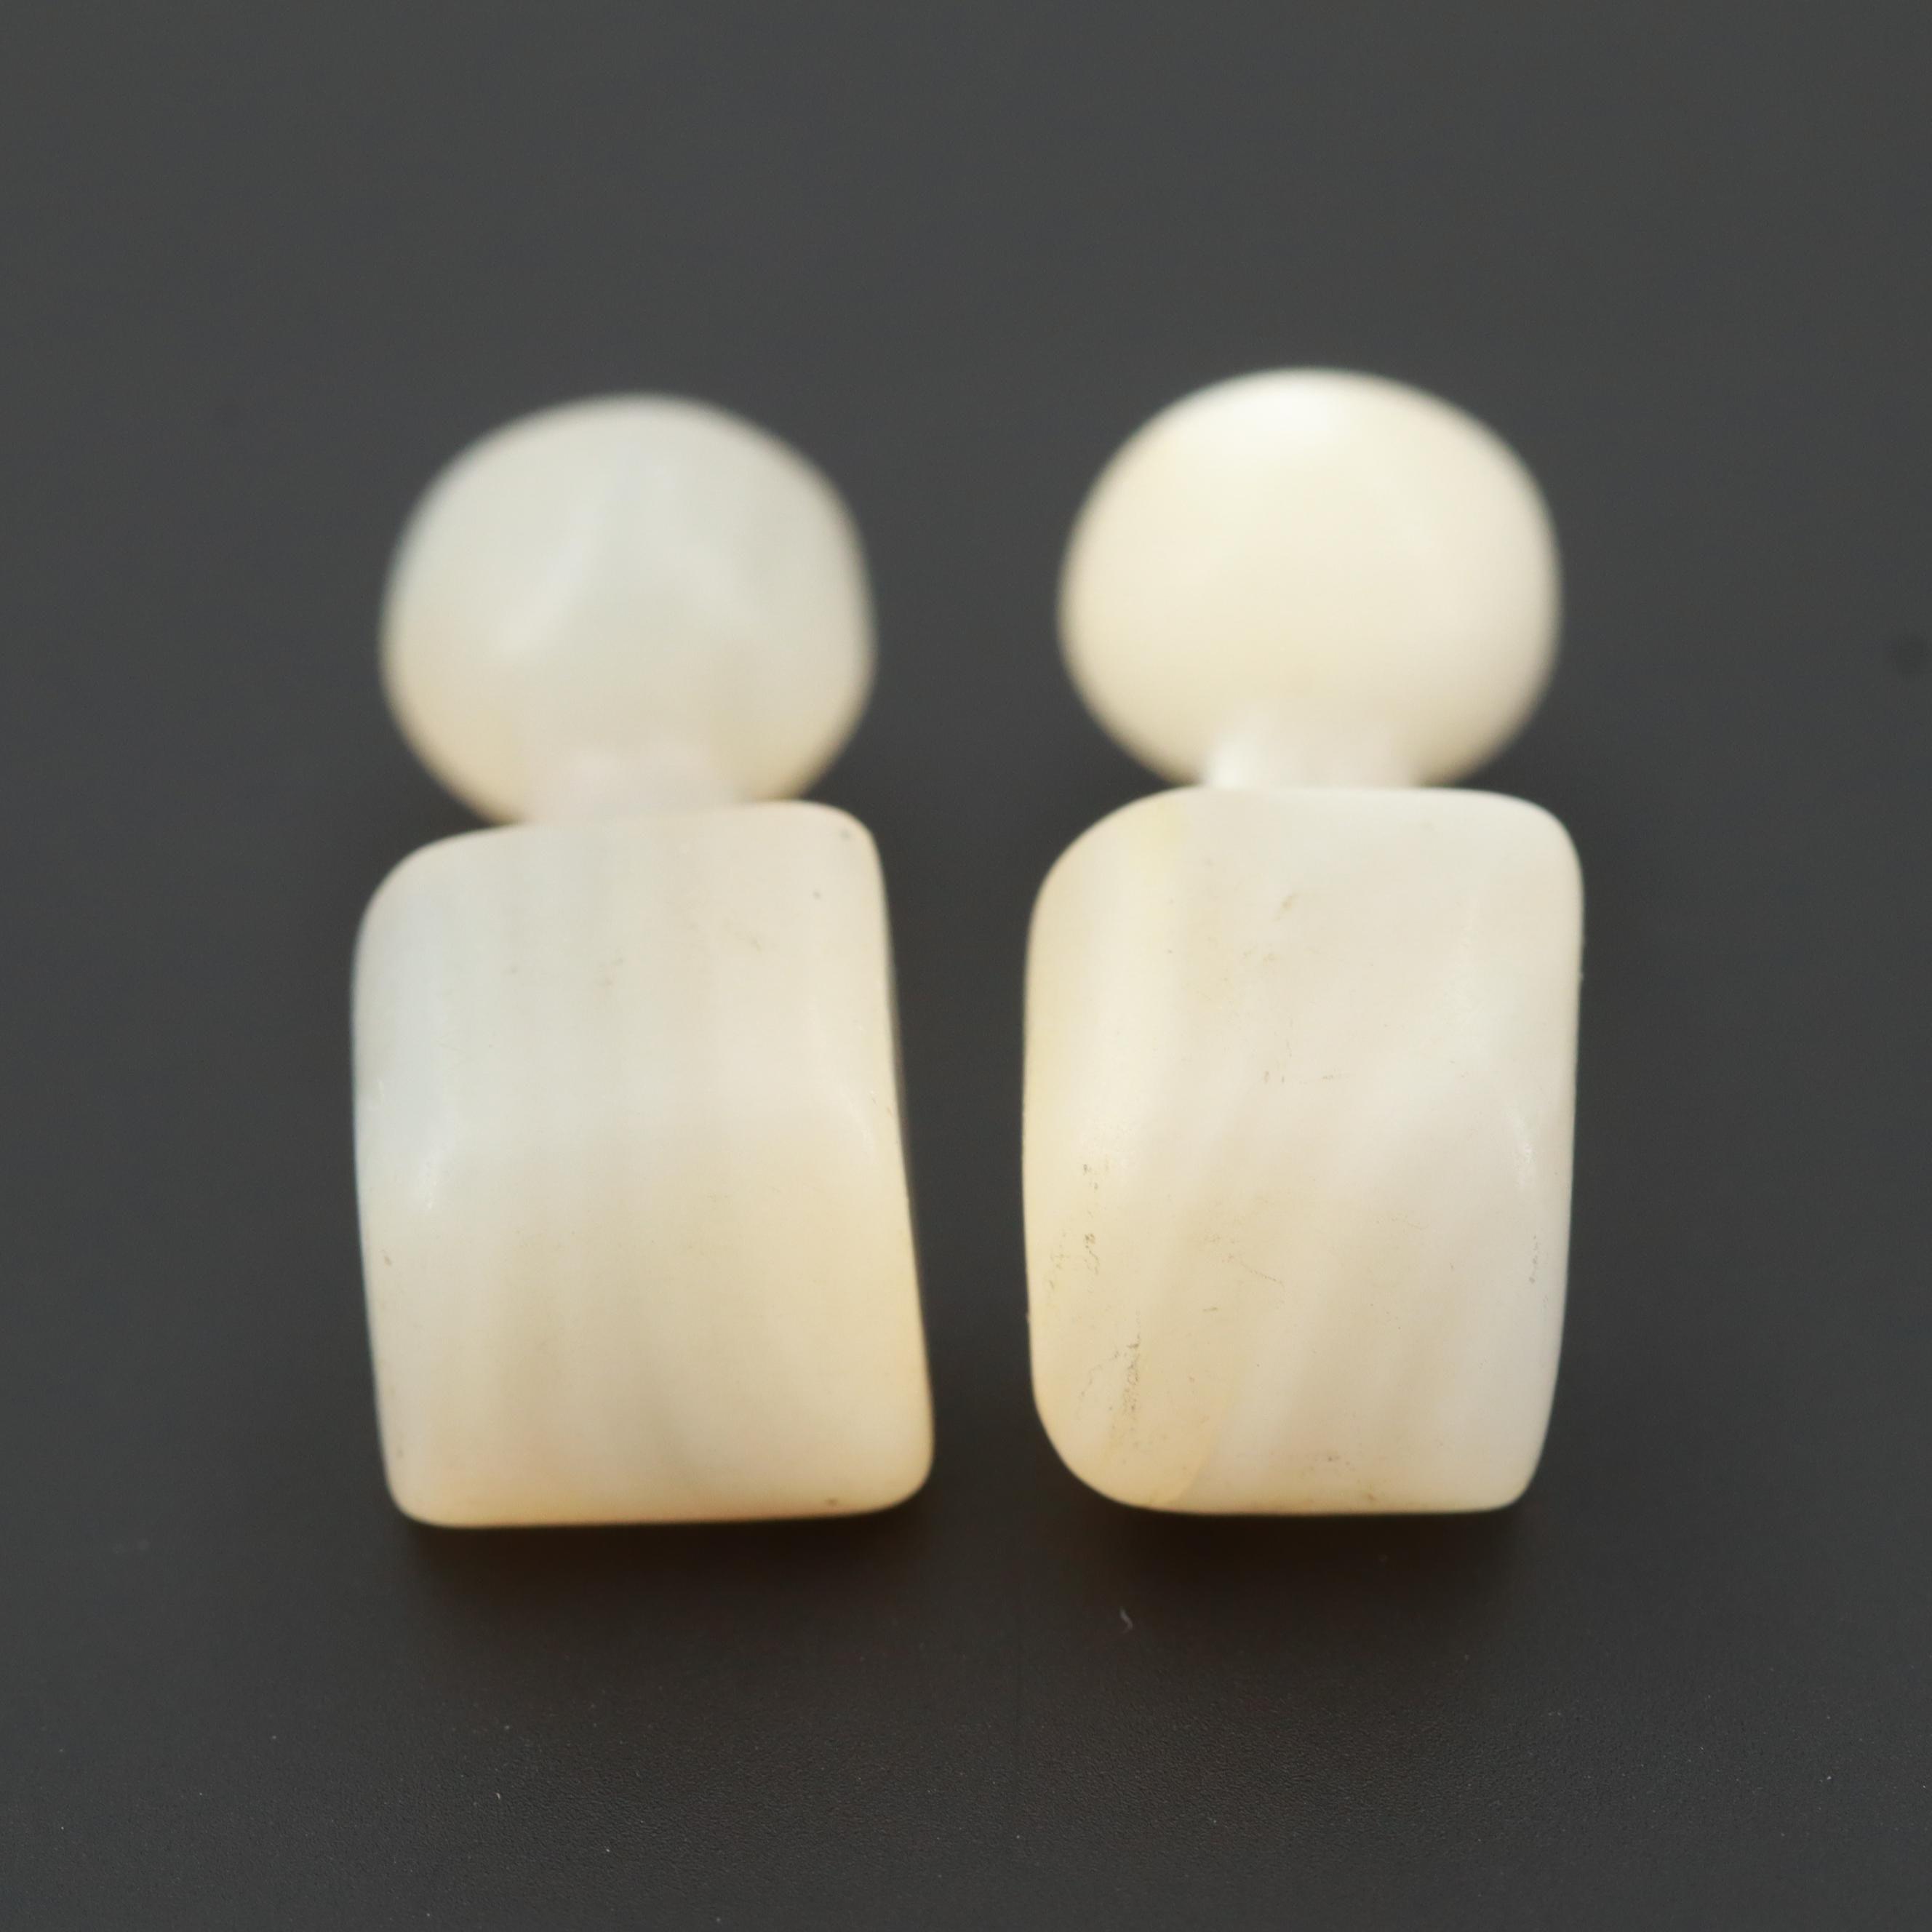 Carved Shell Cufflinks